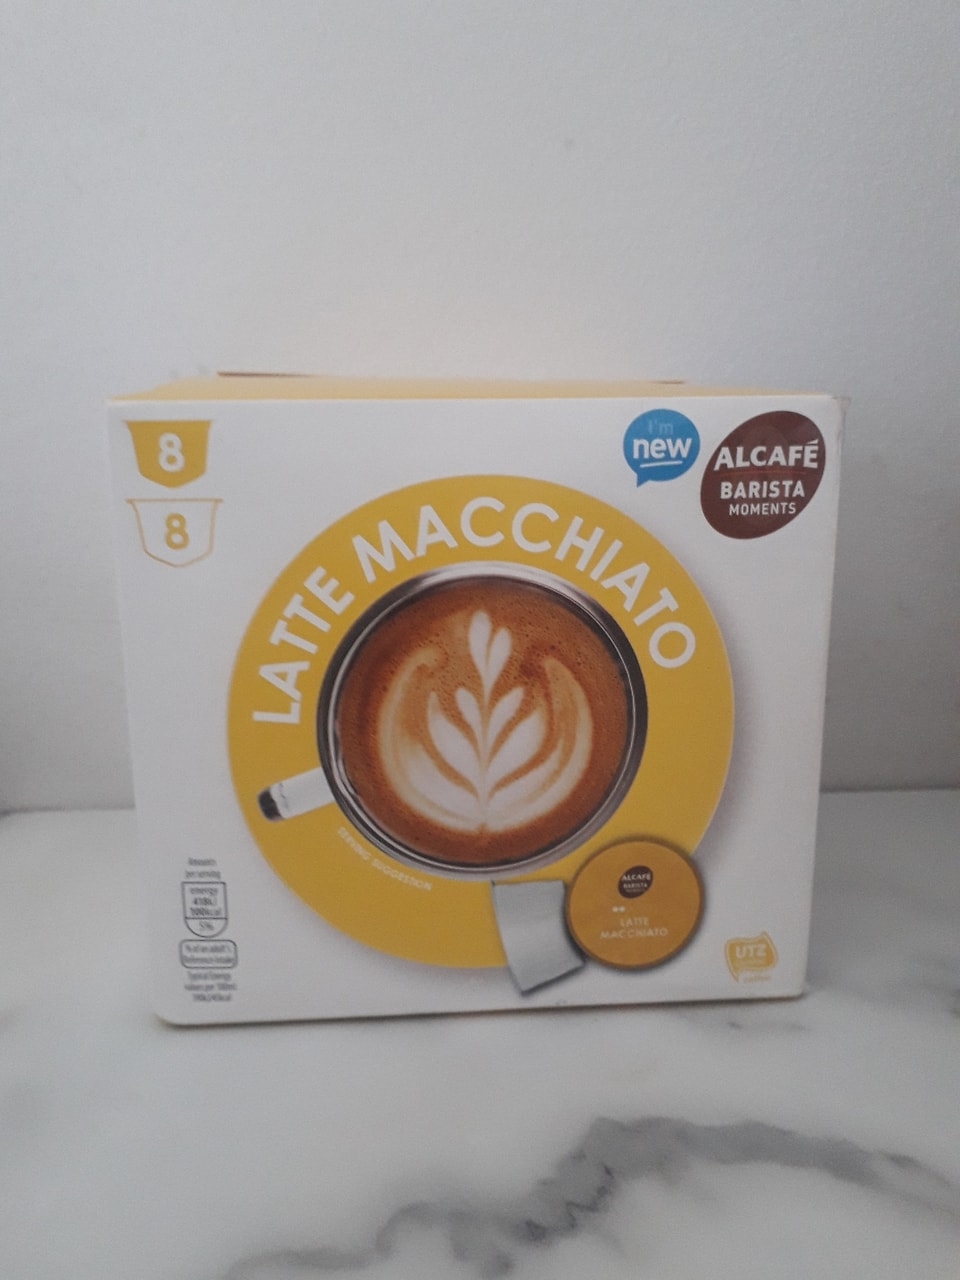 Latte Macchiato capsules